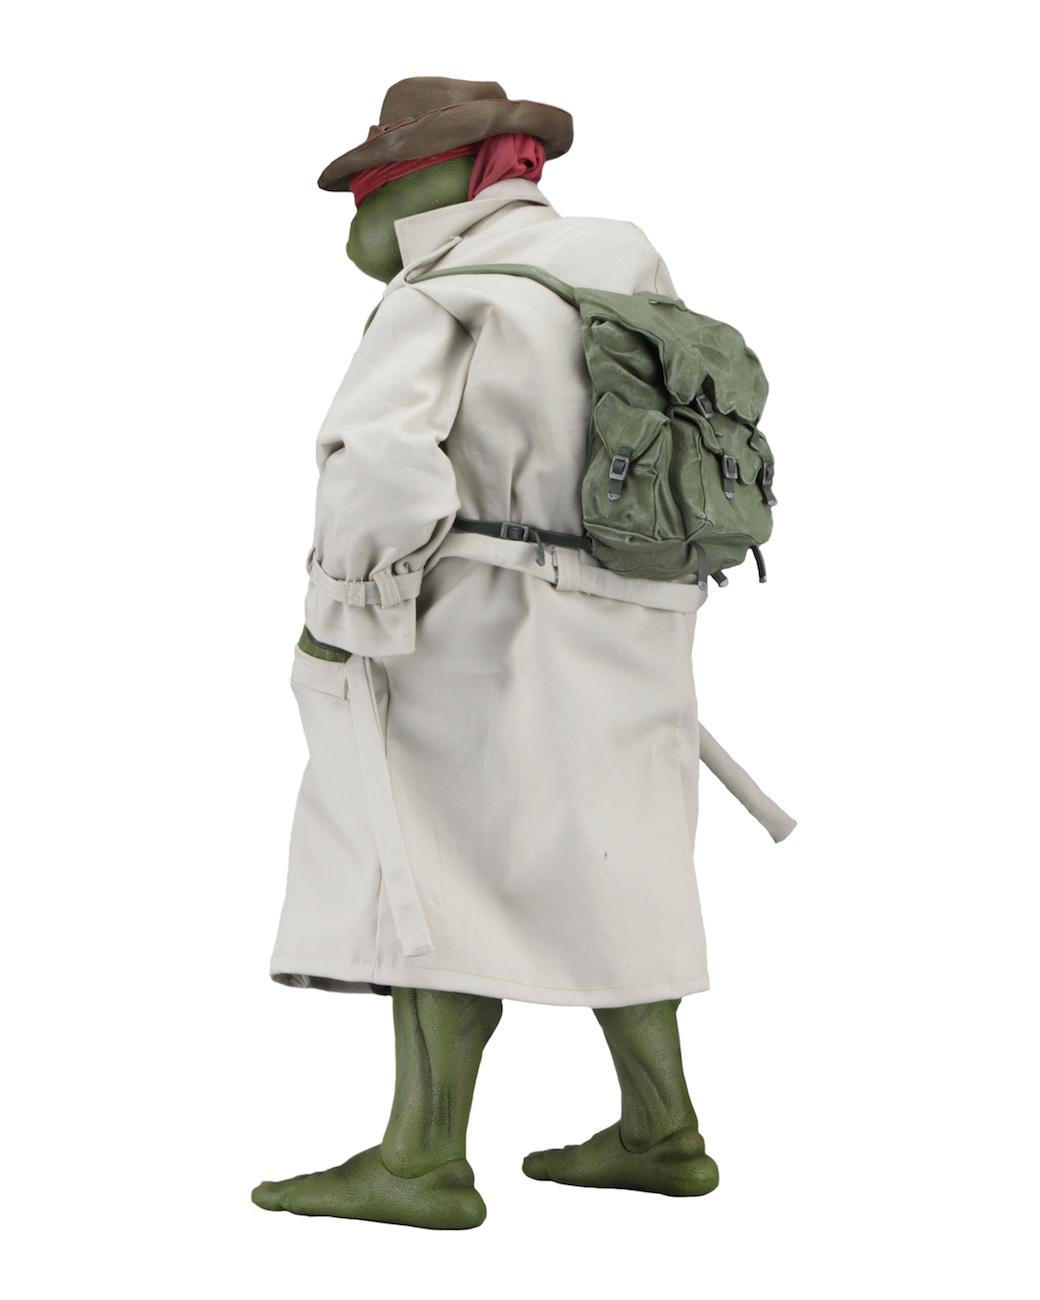 NECA-TMNT-Disguise-Raphael-002